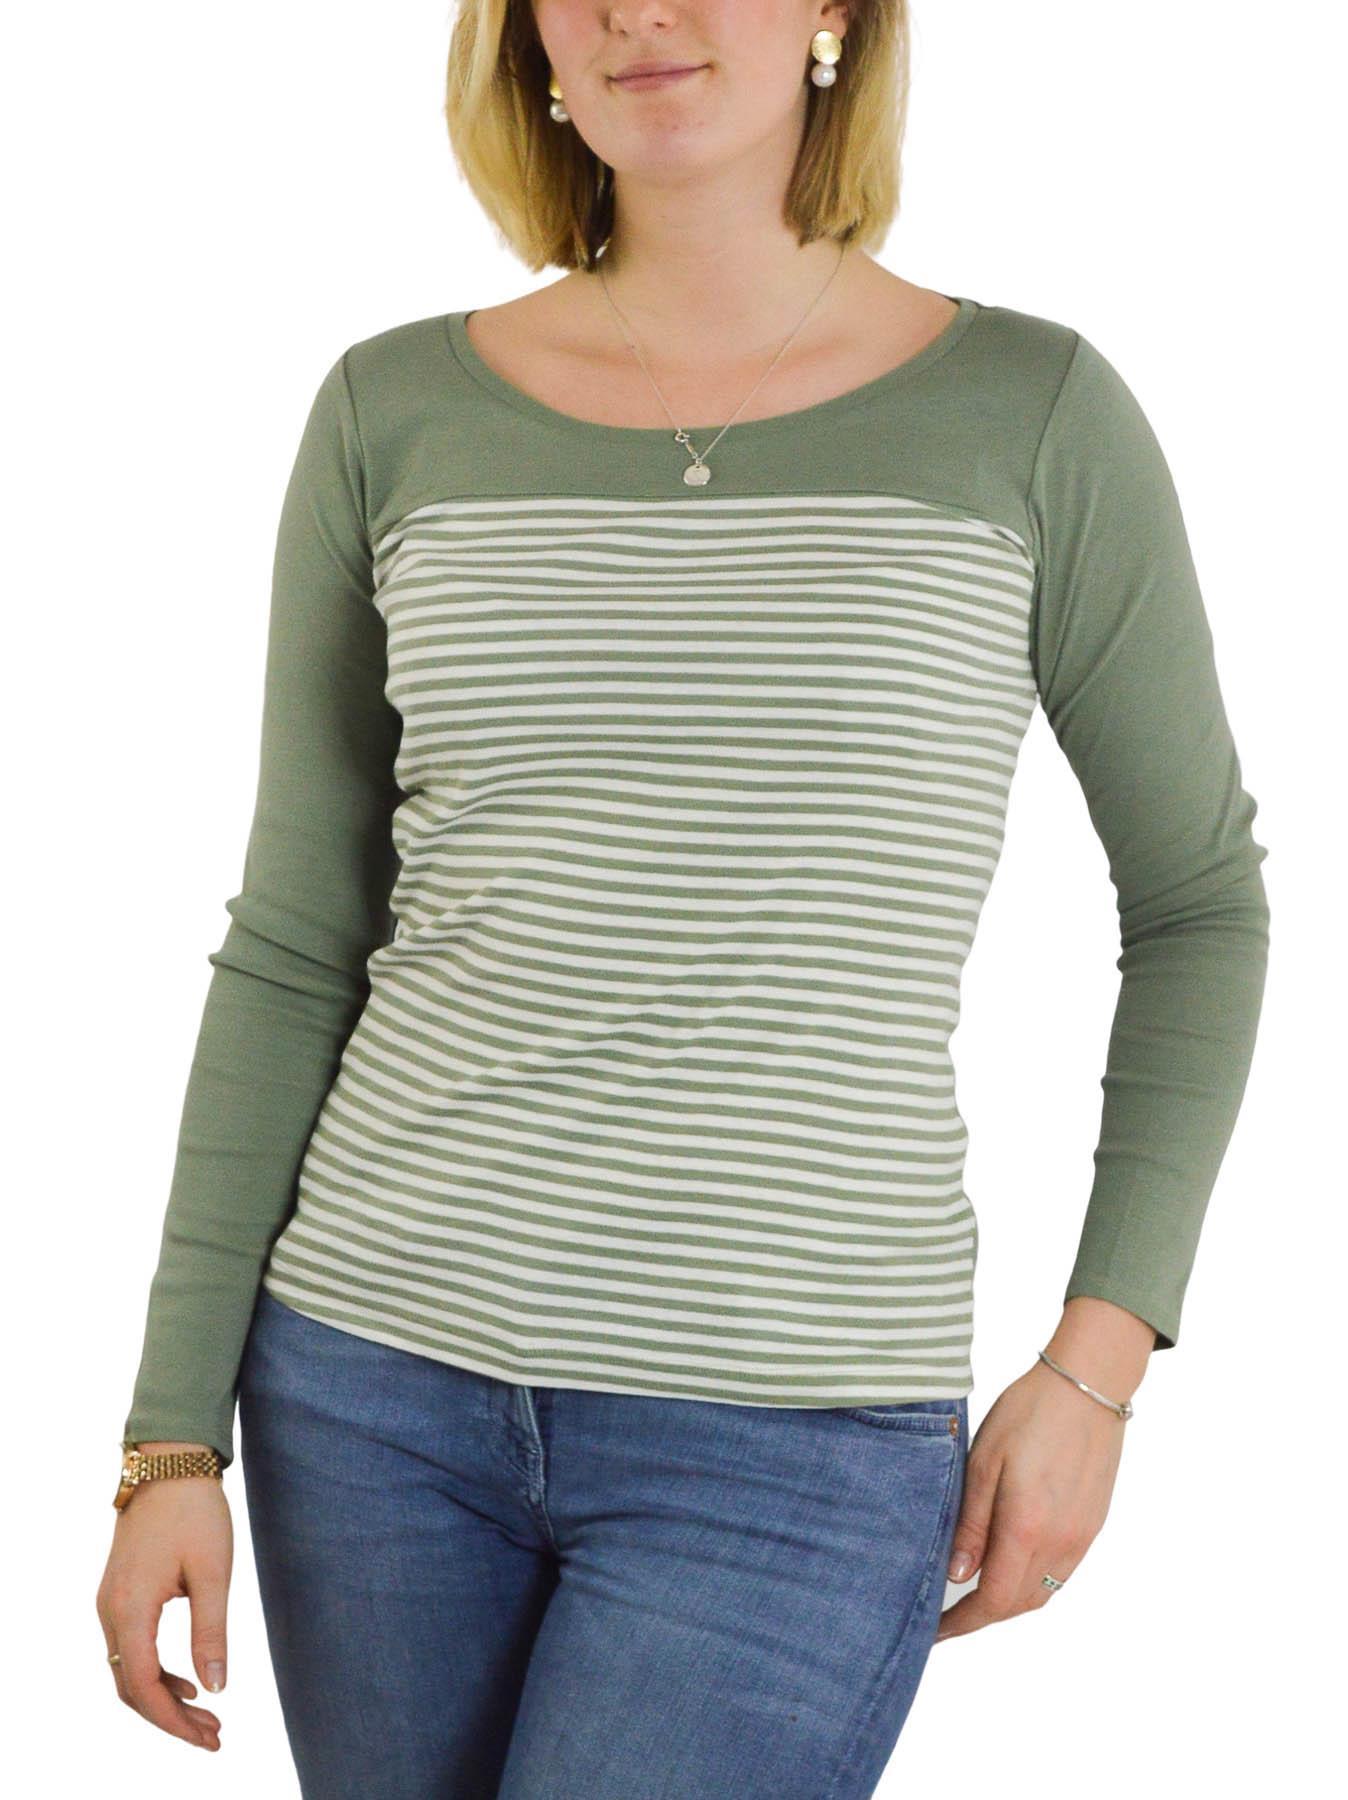 Femmes-a-Rayures-T-shirt-manches-longues-haut-en-jersey-col-rond-kaki-ou-Bleu-marine-Taille-6-24 miniature 6